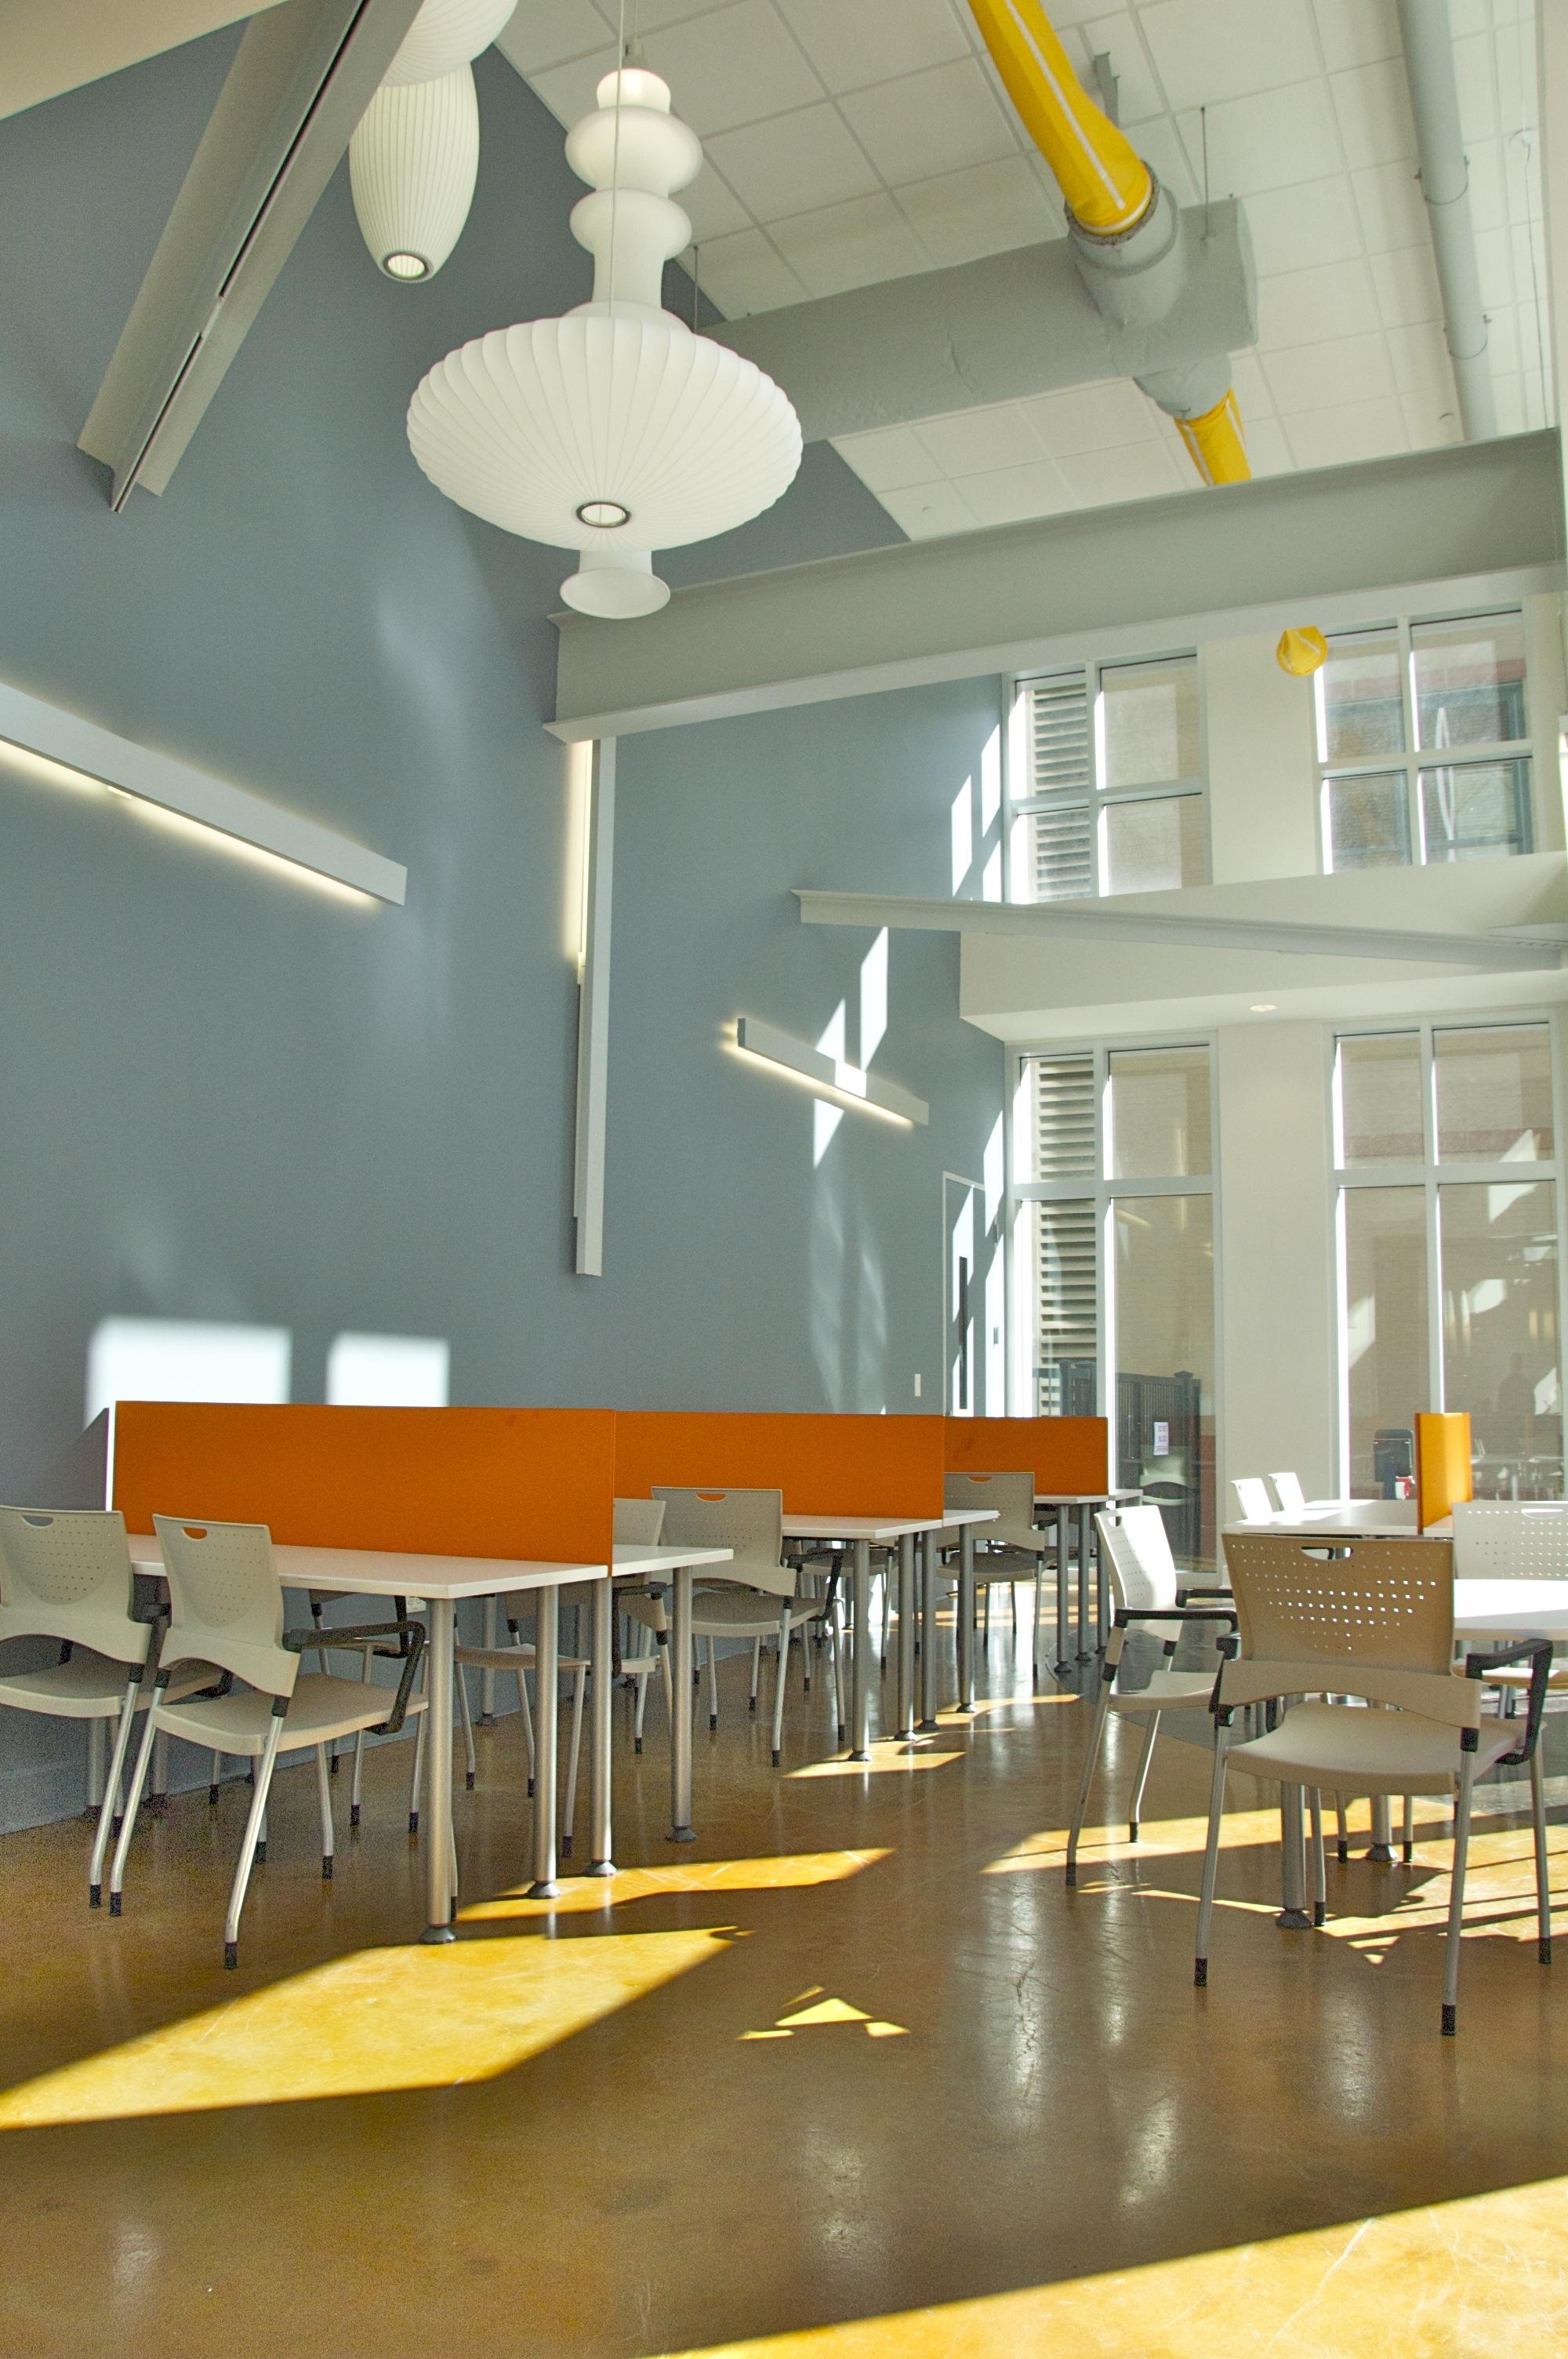 charter school 02.jpg